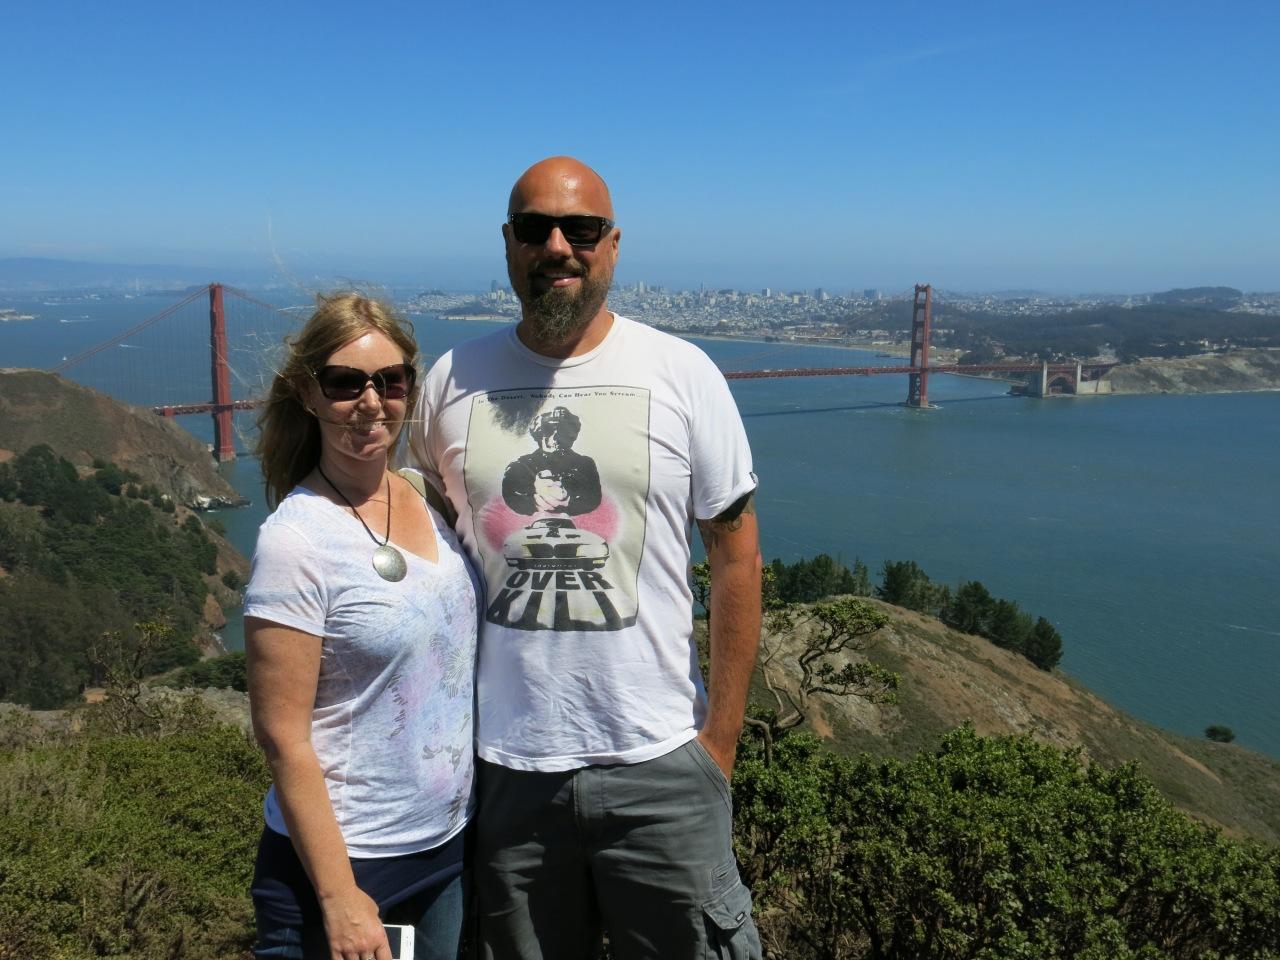 San Francisco! Golden Gate, Alcatraz, gay times, hippies and tikibars!